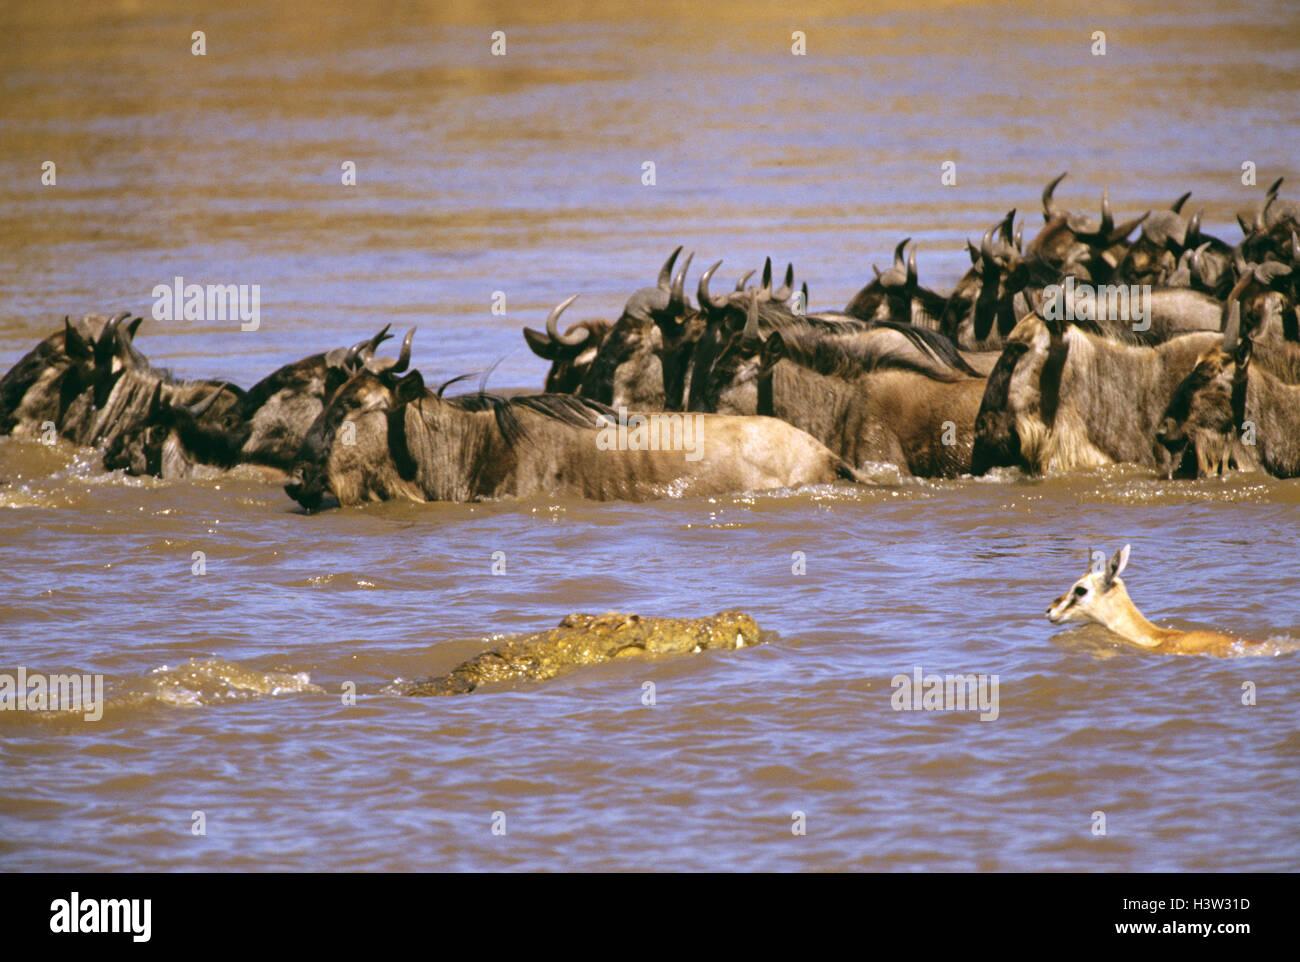 Nile crocodile (Crocodylus niloticus) Stock Photo